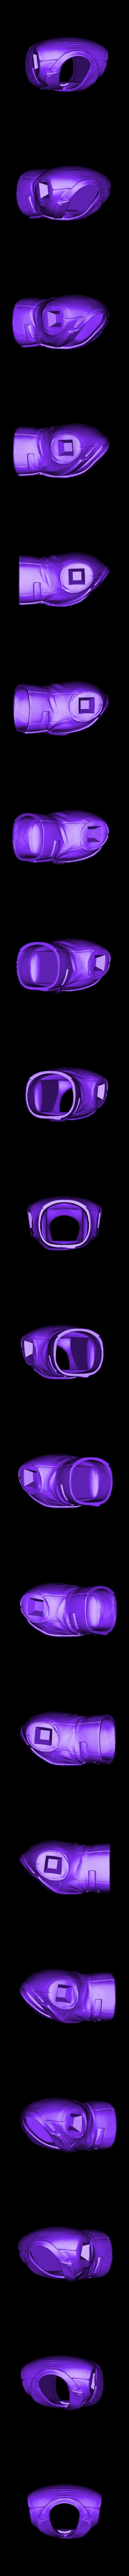 Jacket.stl Download free STL file Bold Machines: Mr. Walthersnap • 3D print design, boldmachines